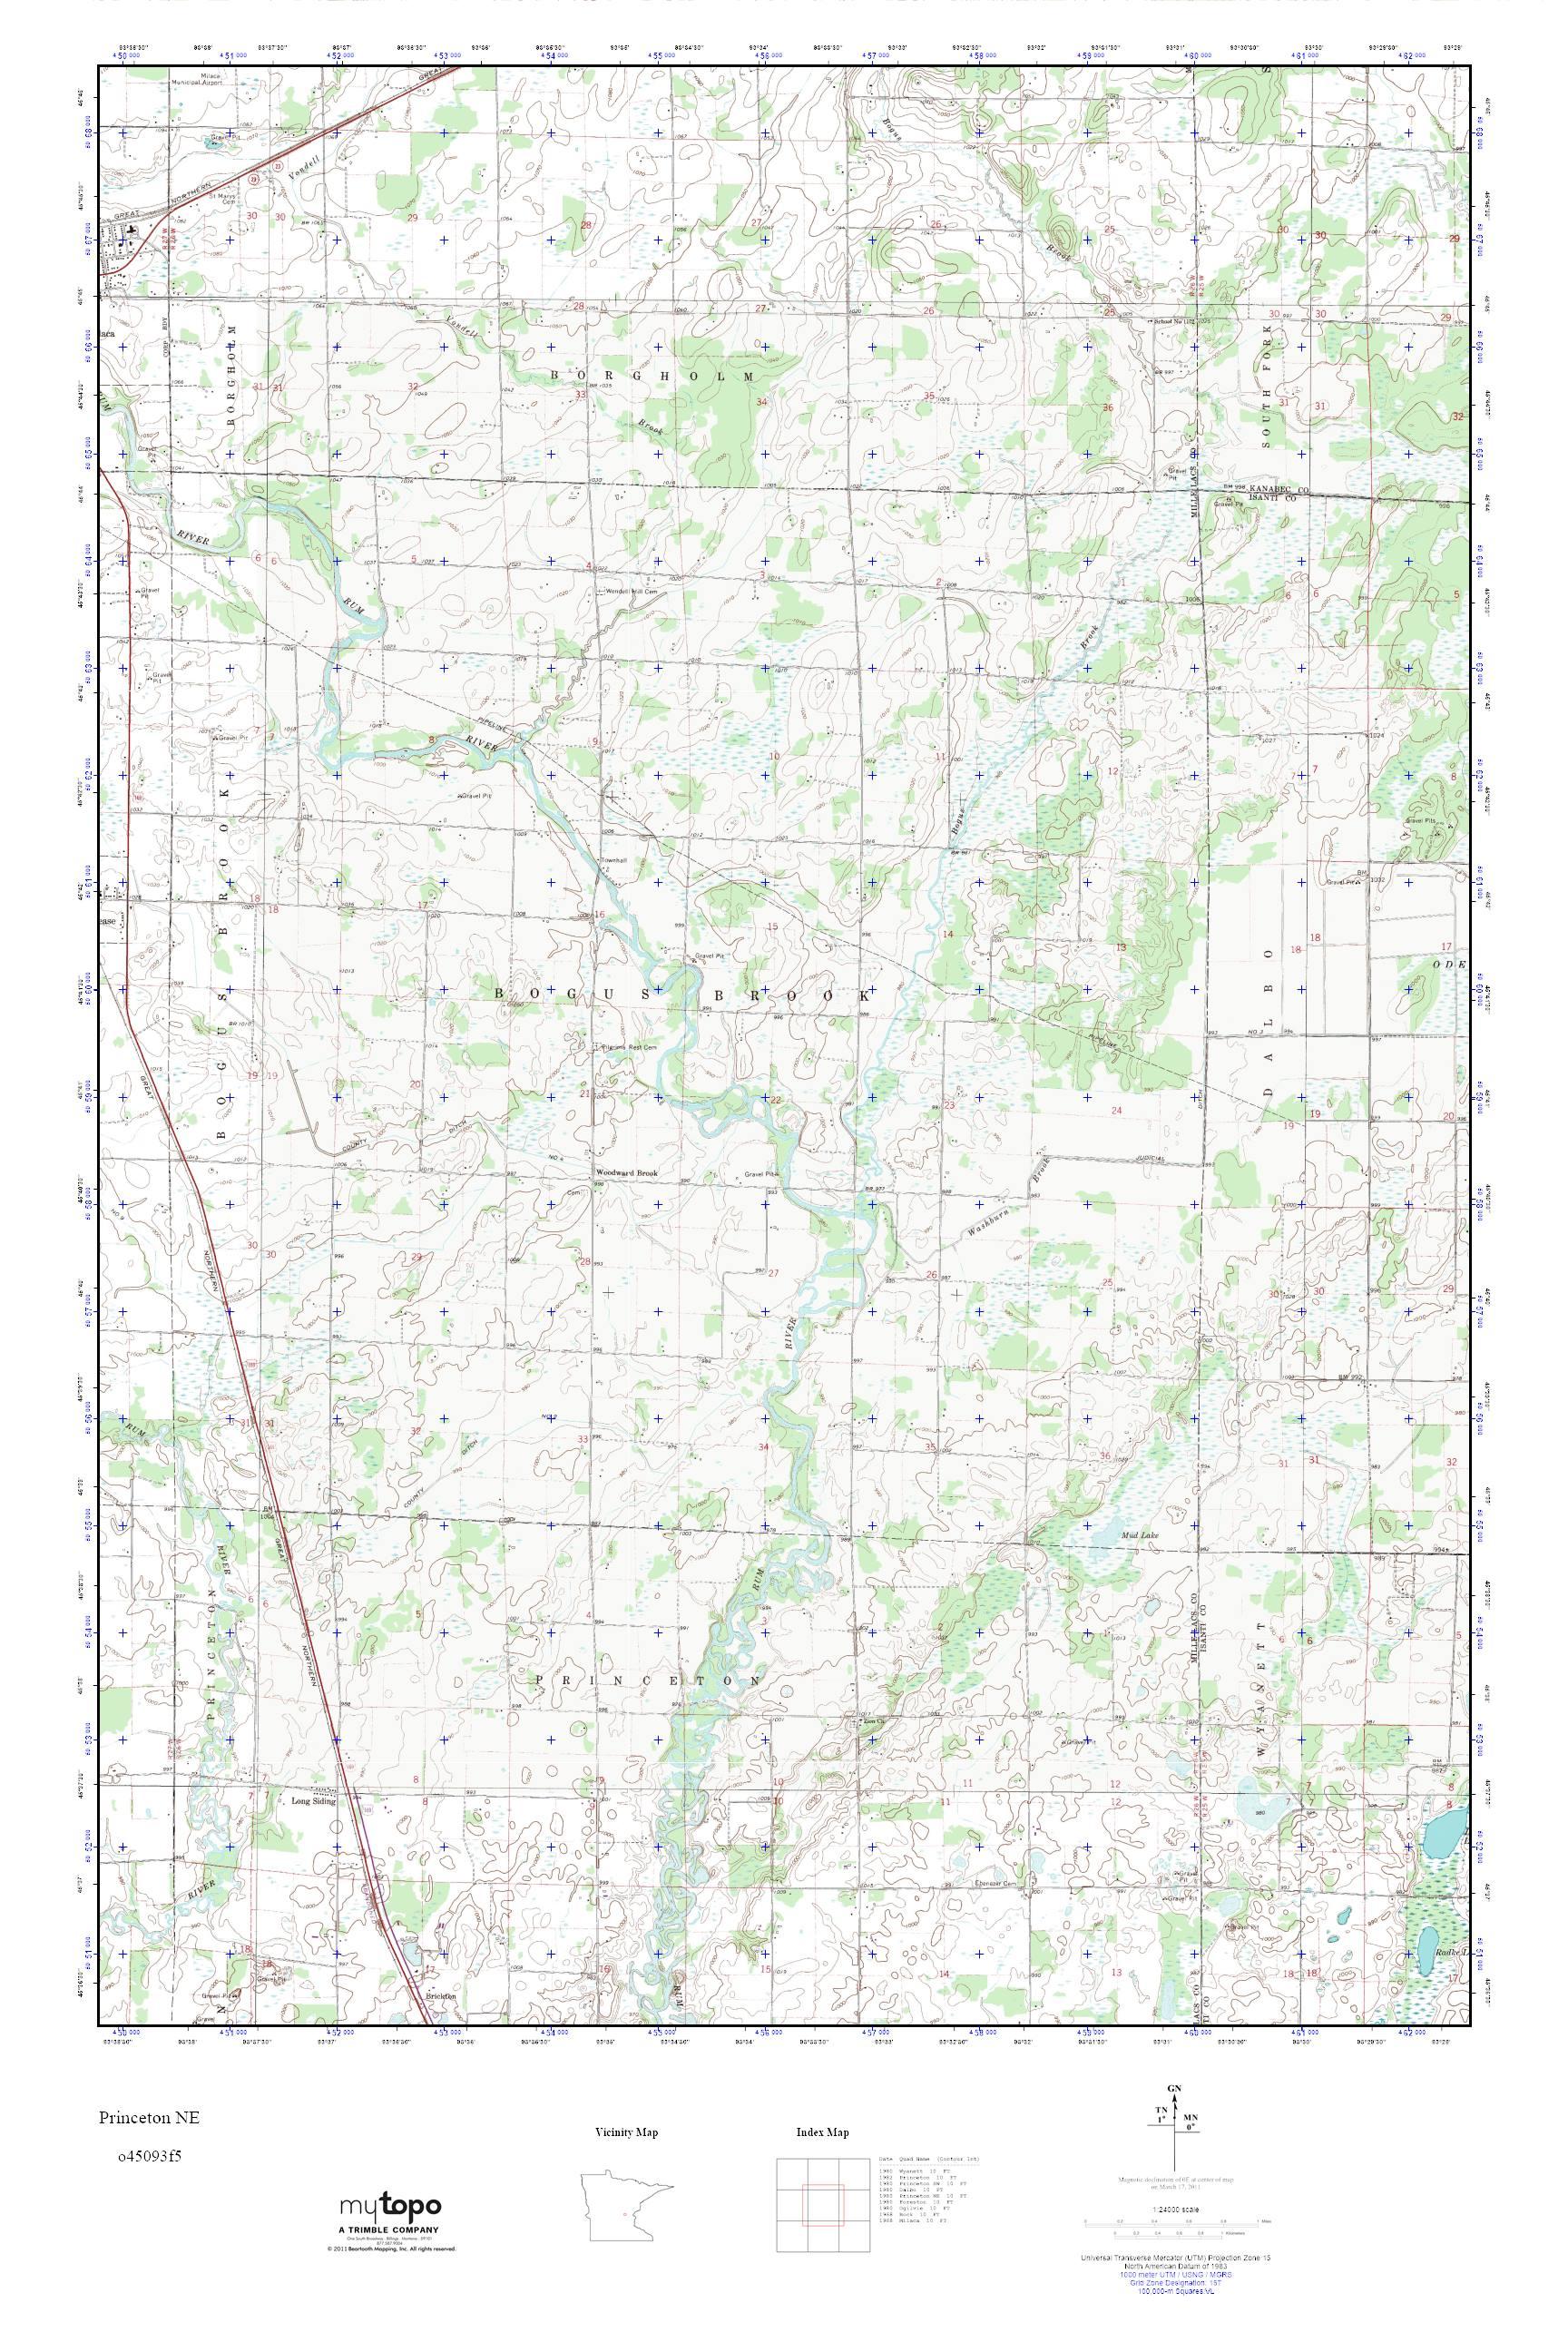 Princeton Minnesota Map.Mytopo Princeton Ne Minnesota Usgs Quad Topo Map